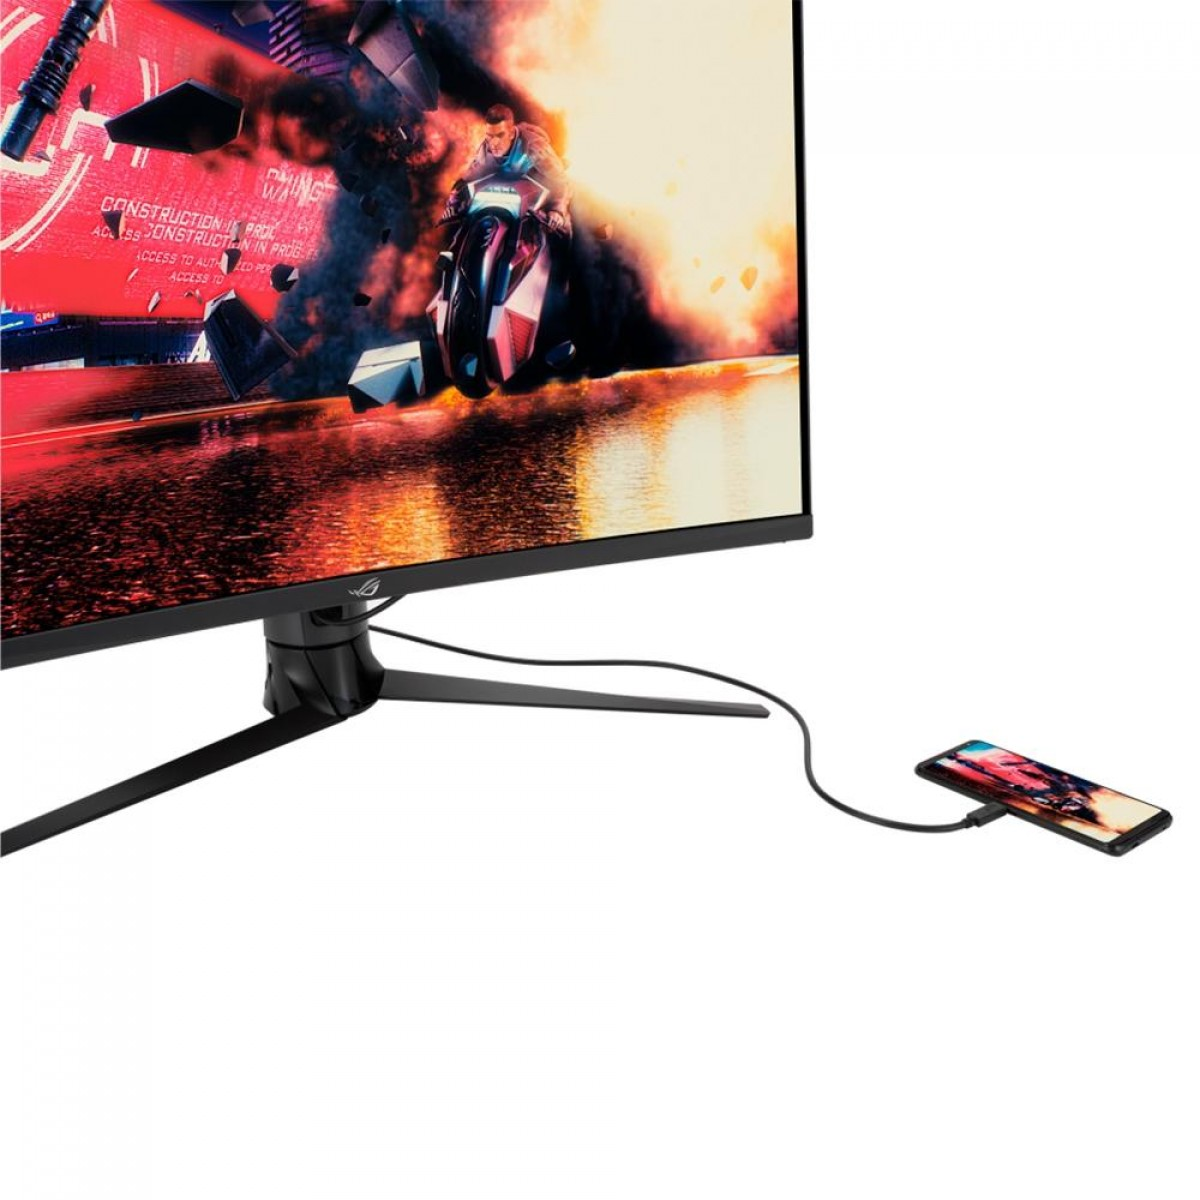 Monitor Gamer Asus ROG Strix XG32VC, 31.5, WHQHD, 1ms, 170Hz, HDR400, Curvo, HDMI, DisplayPort, USB, FreeSync Premium Pro, 90LM03S0-B041B0